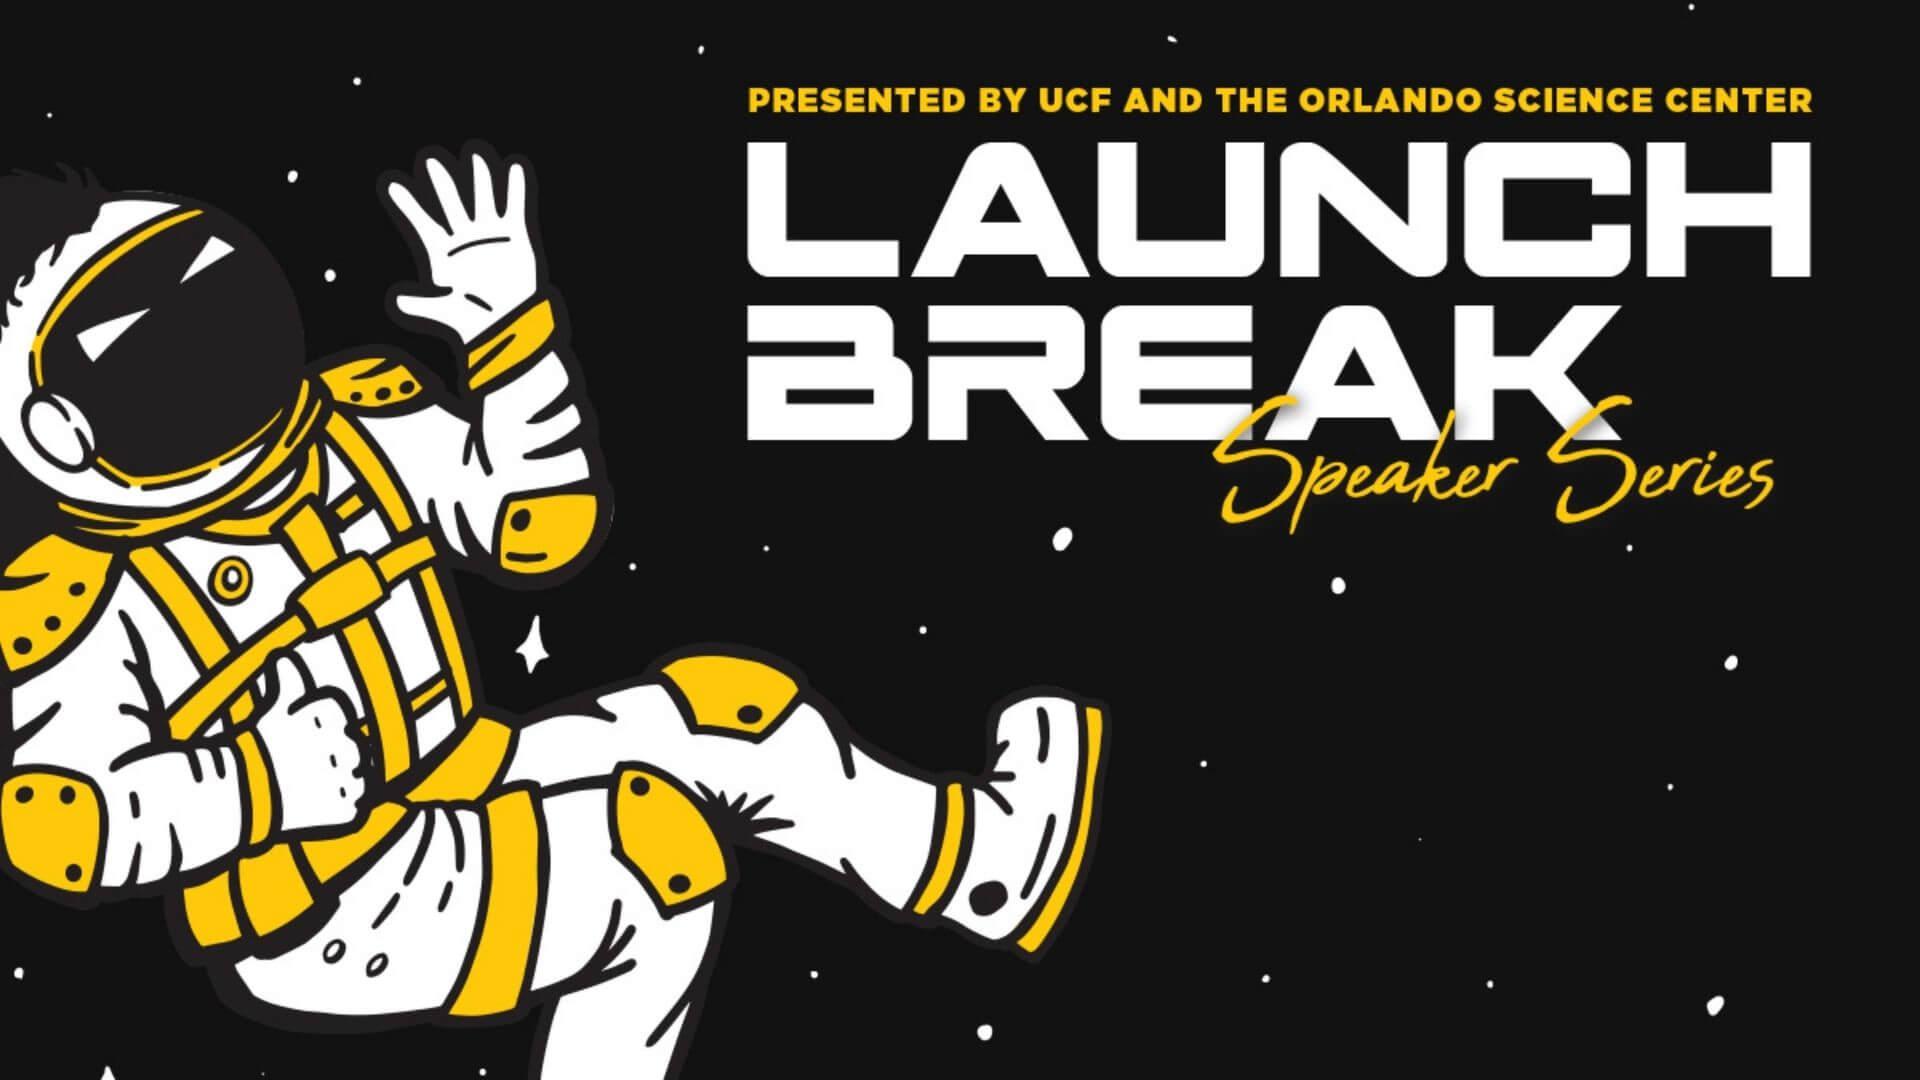 Astronaut waving - Launch Break A Speaker Series